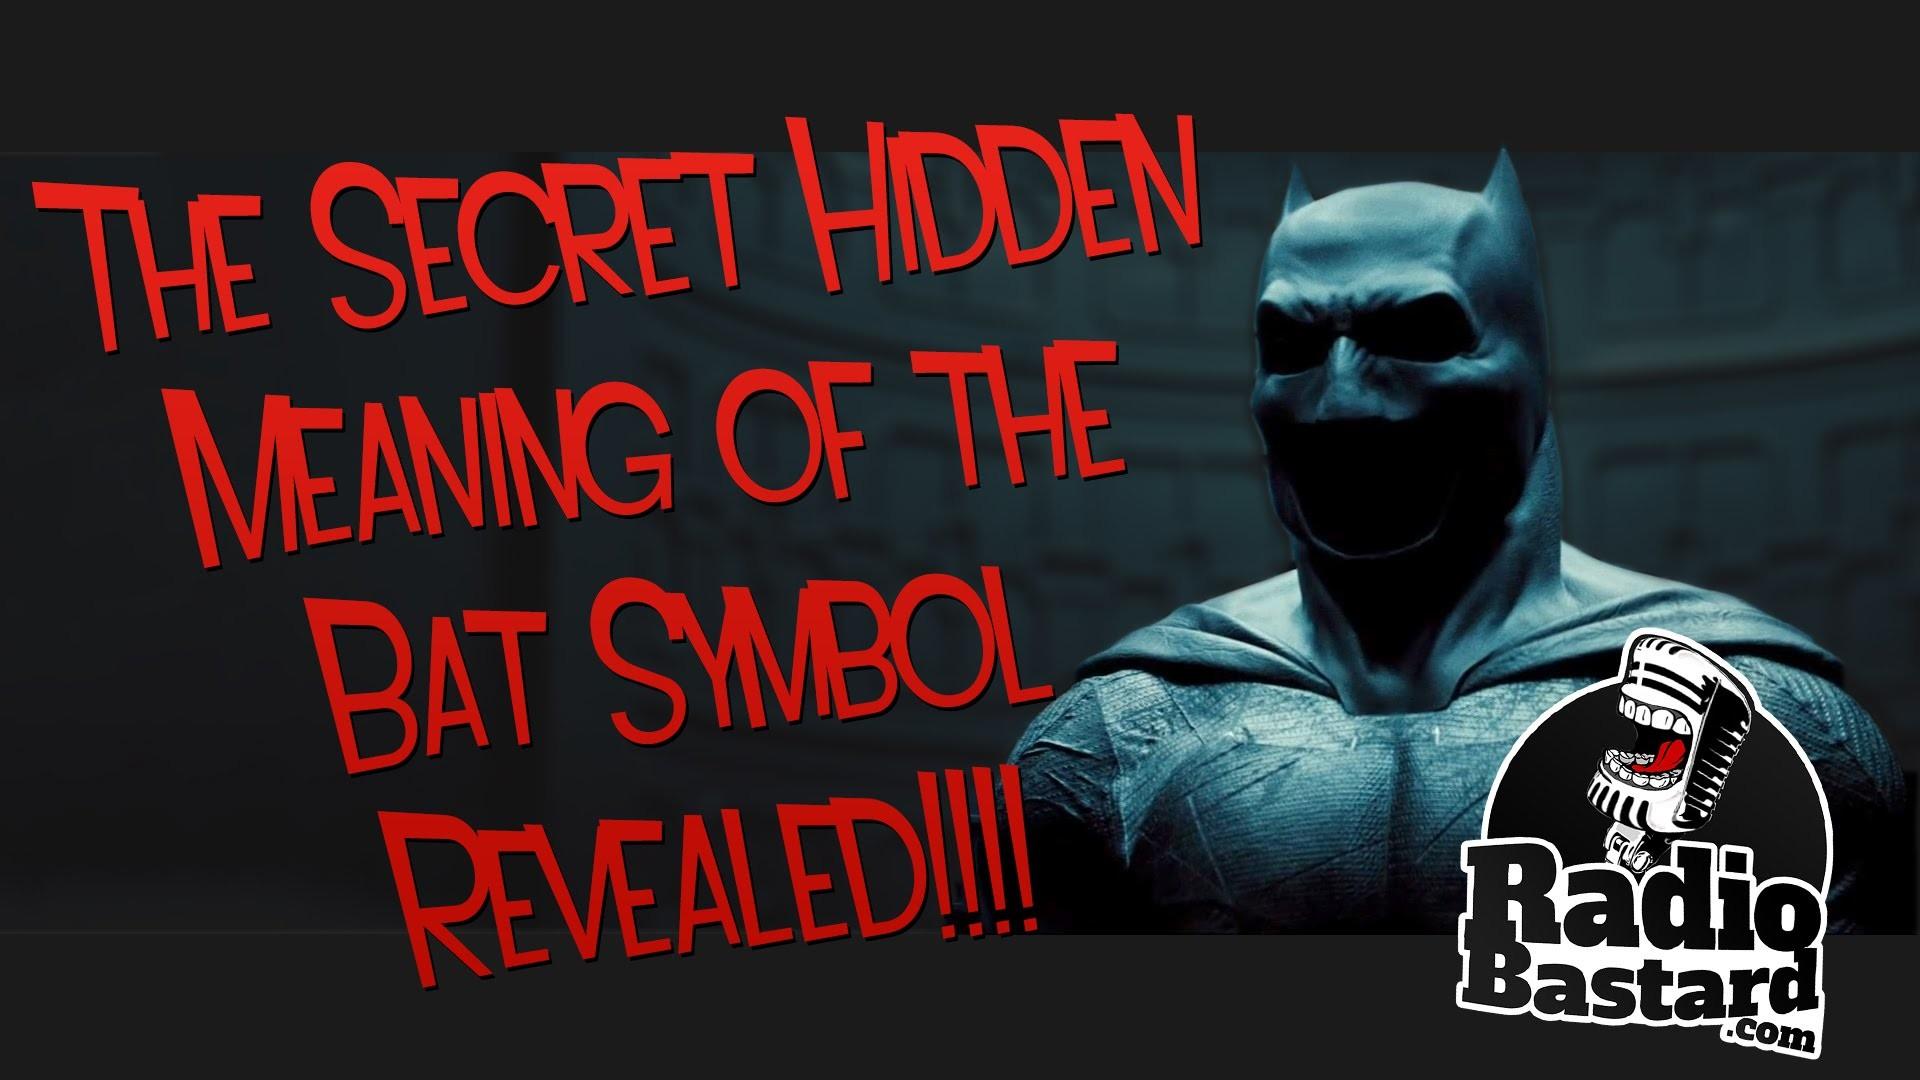 Batman v Superman : The Secret Hidden Meaning of the Bat Symbol Revealed!!!  – YouTube